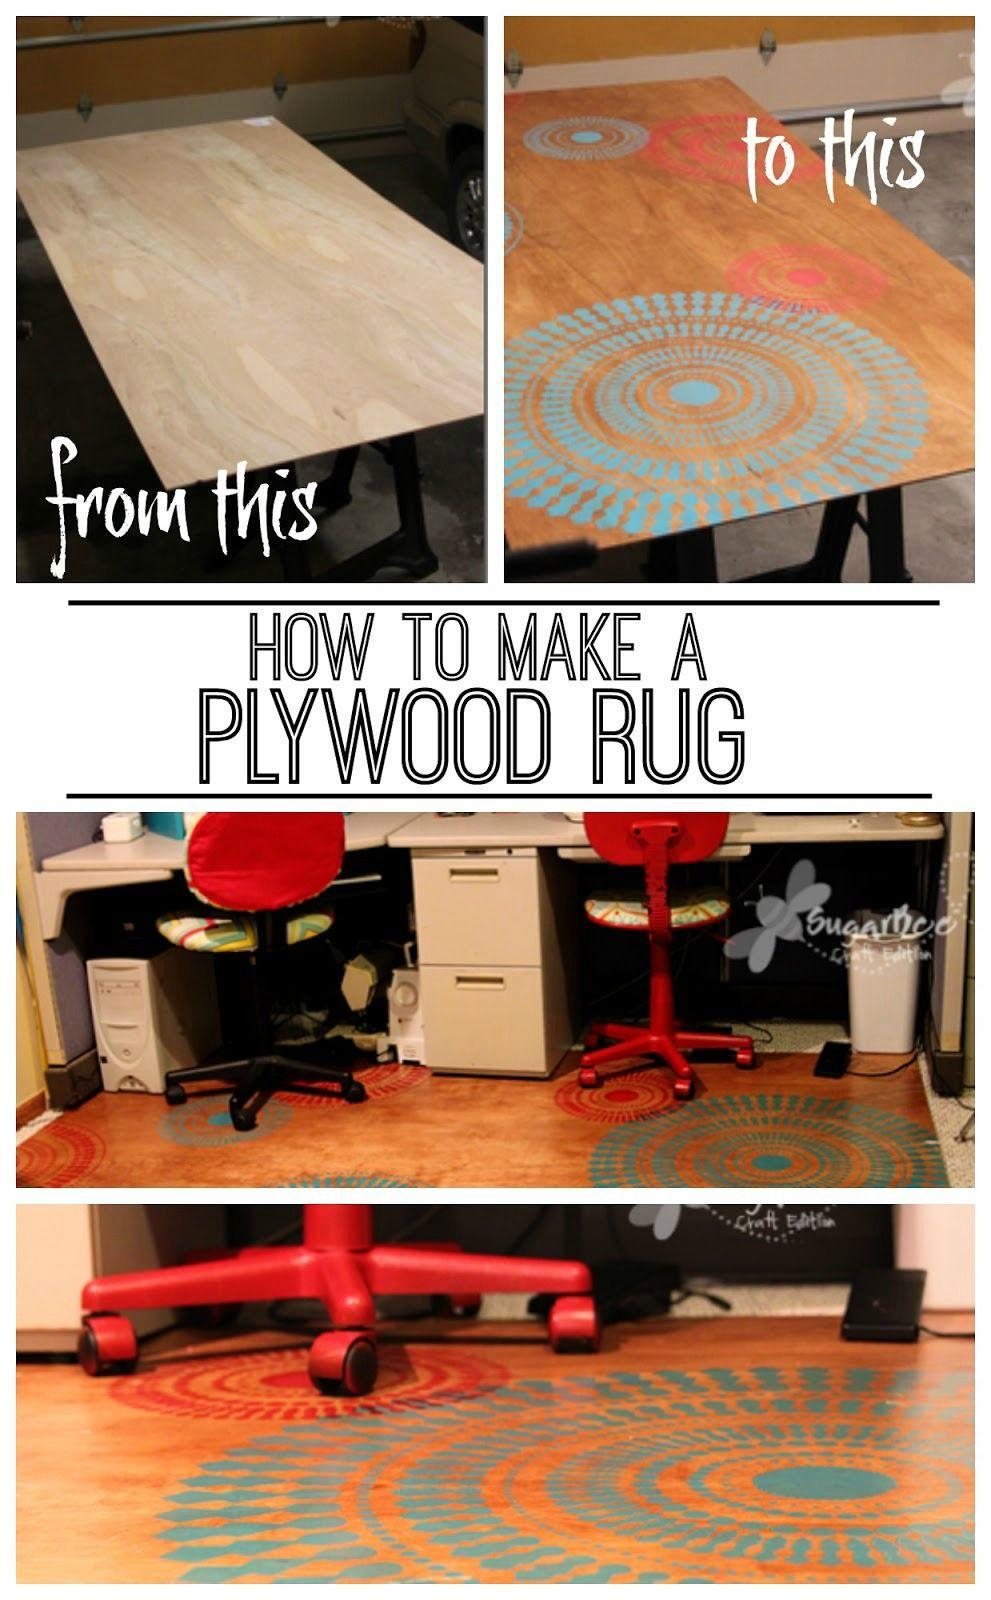 Plywood Rug Diy home decor, Diy furniture, Home crafts